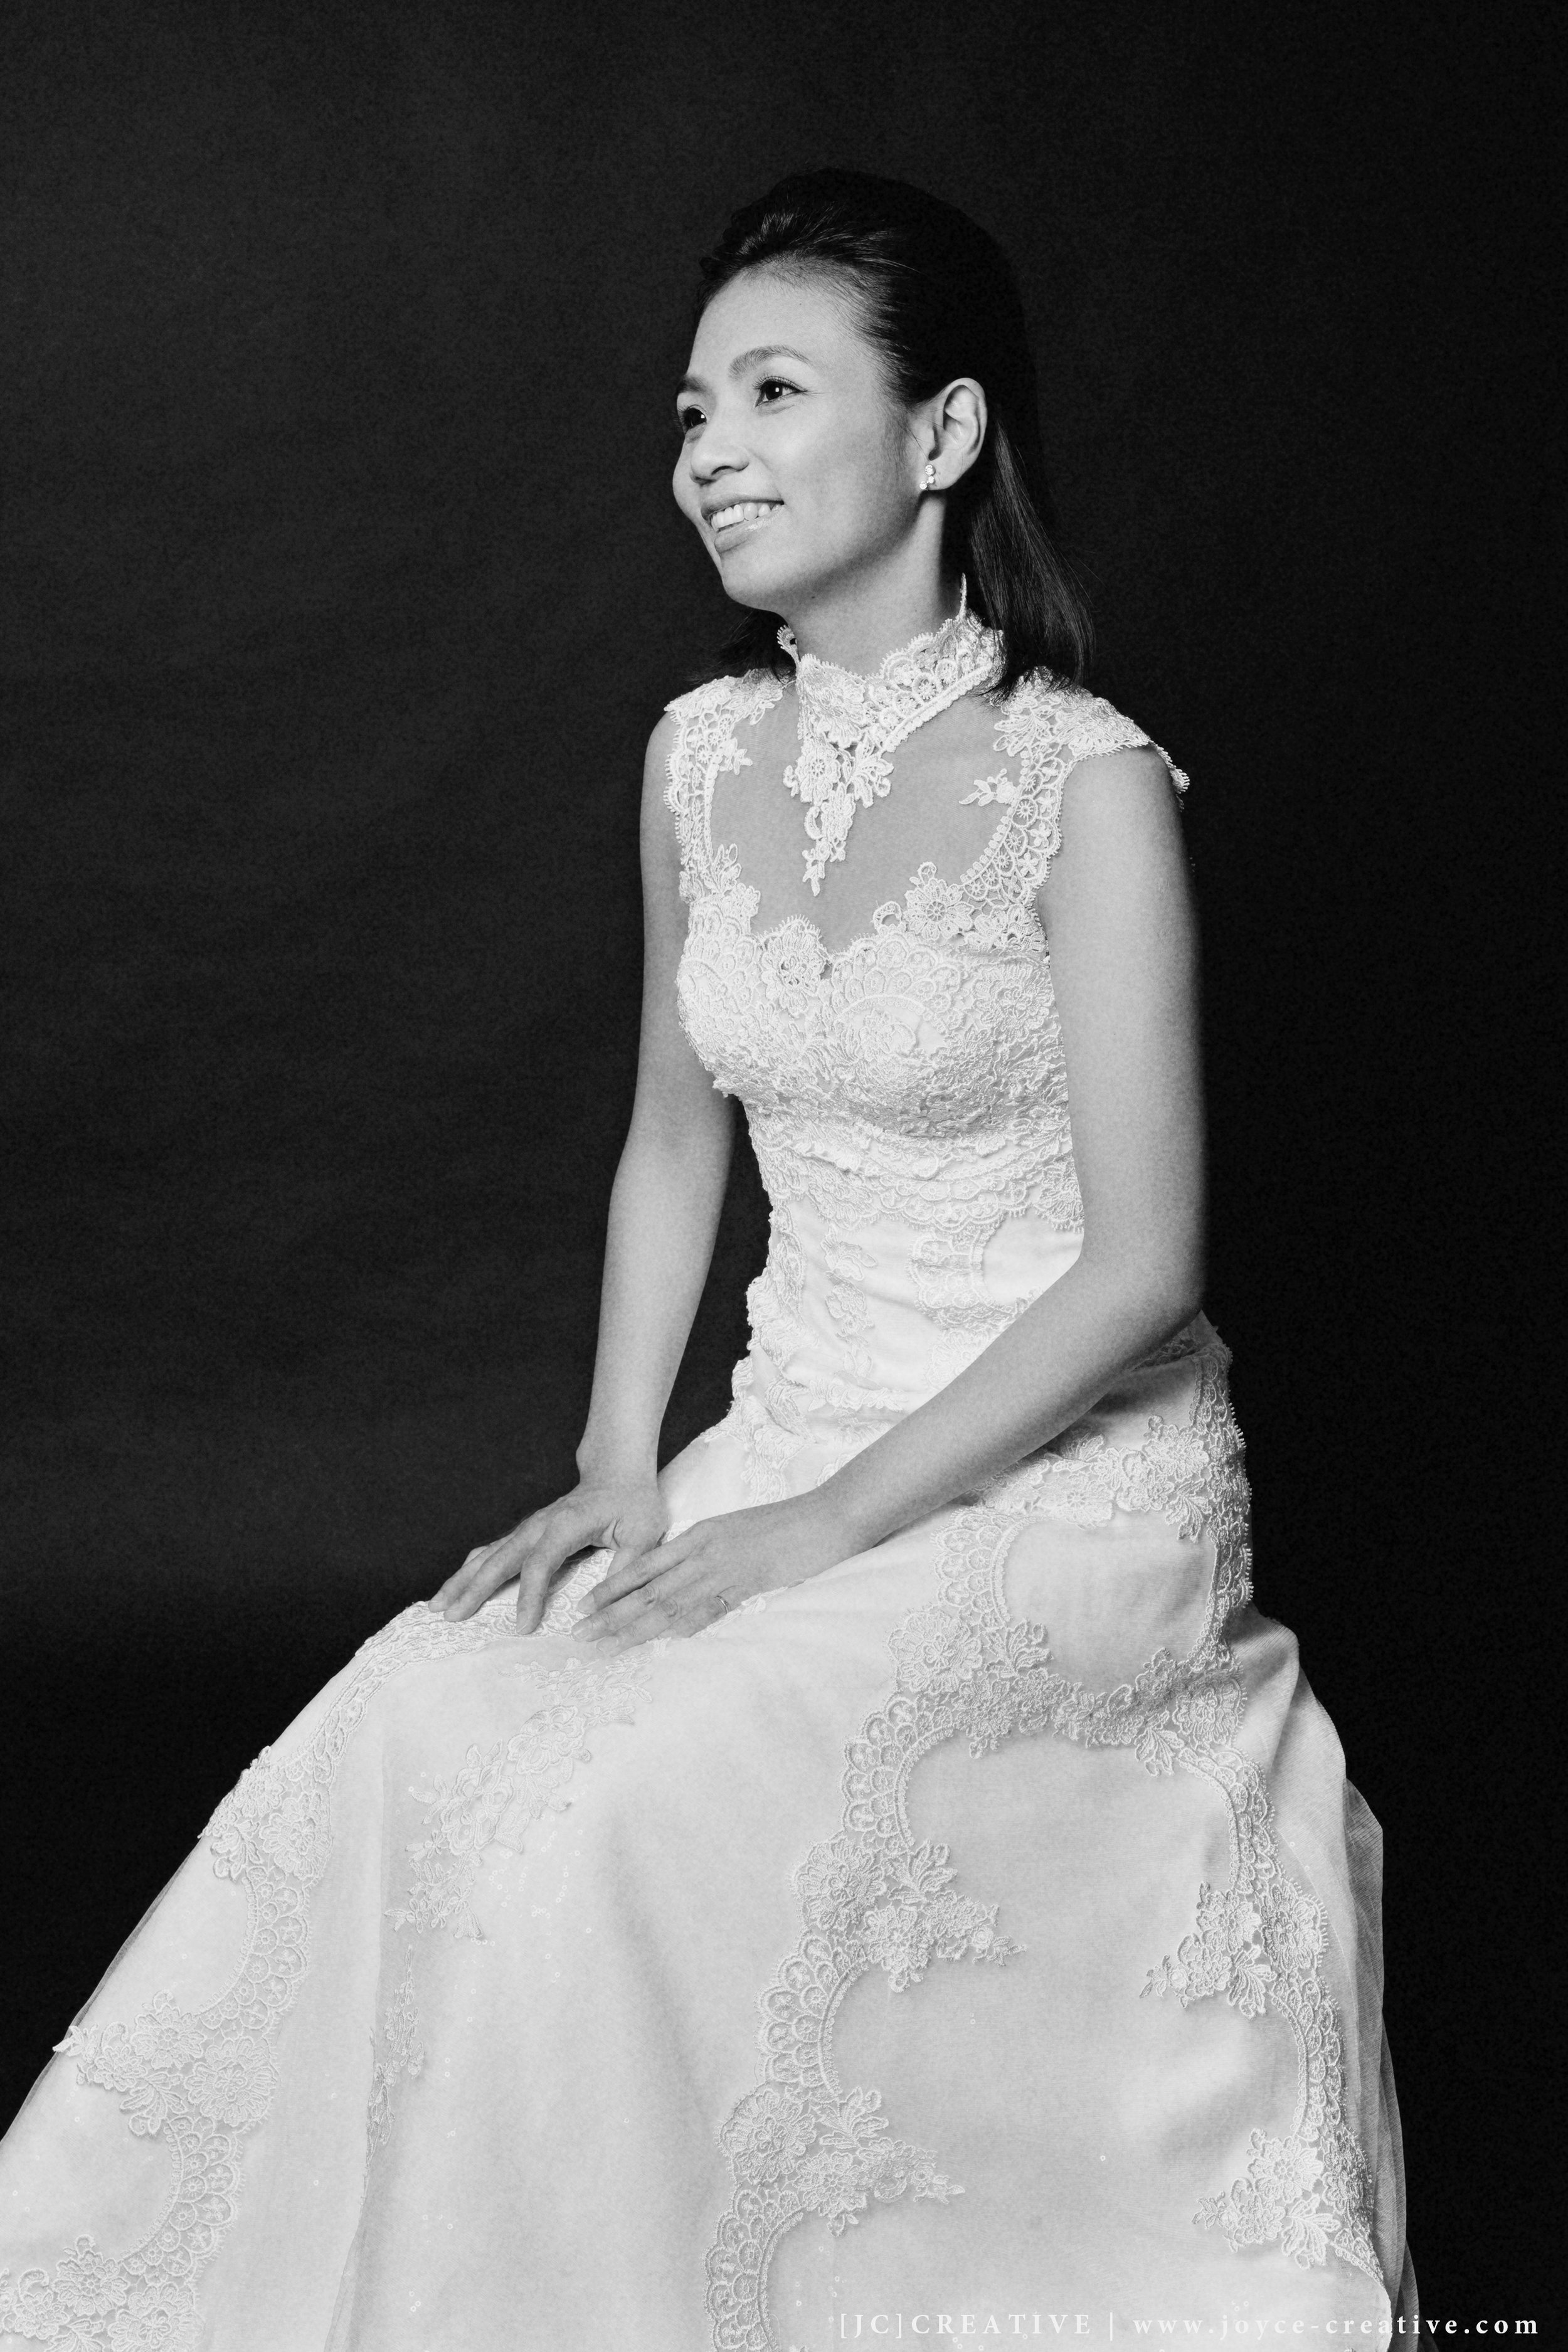 [JC]CREATIVE 女性攝影師  自主婚紗 台灣自助婚紗 香港攝影師  台灣攝影師 婚紗人像 肖像 PORTRAIT photography  PORTRAIT JE WEDDING W時尚美學 桃園婚紗推薦 婚紗寫真個人婚紗  圖像00005.JPG